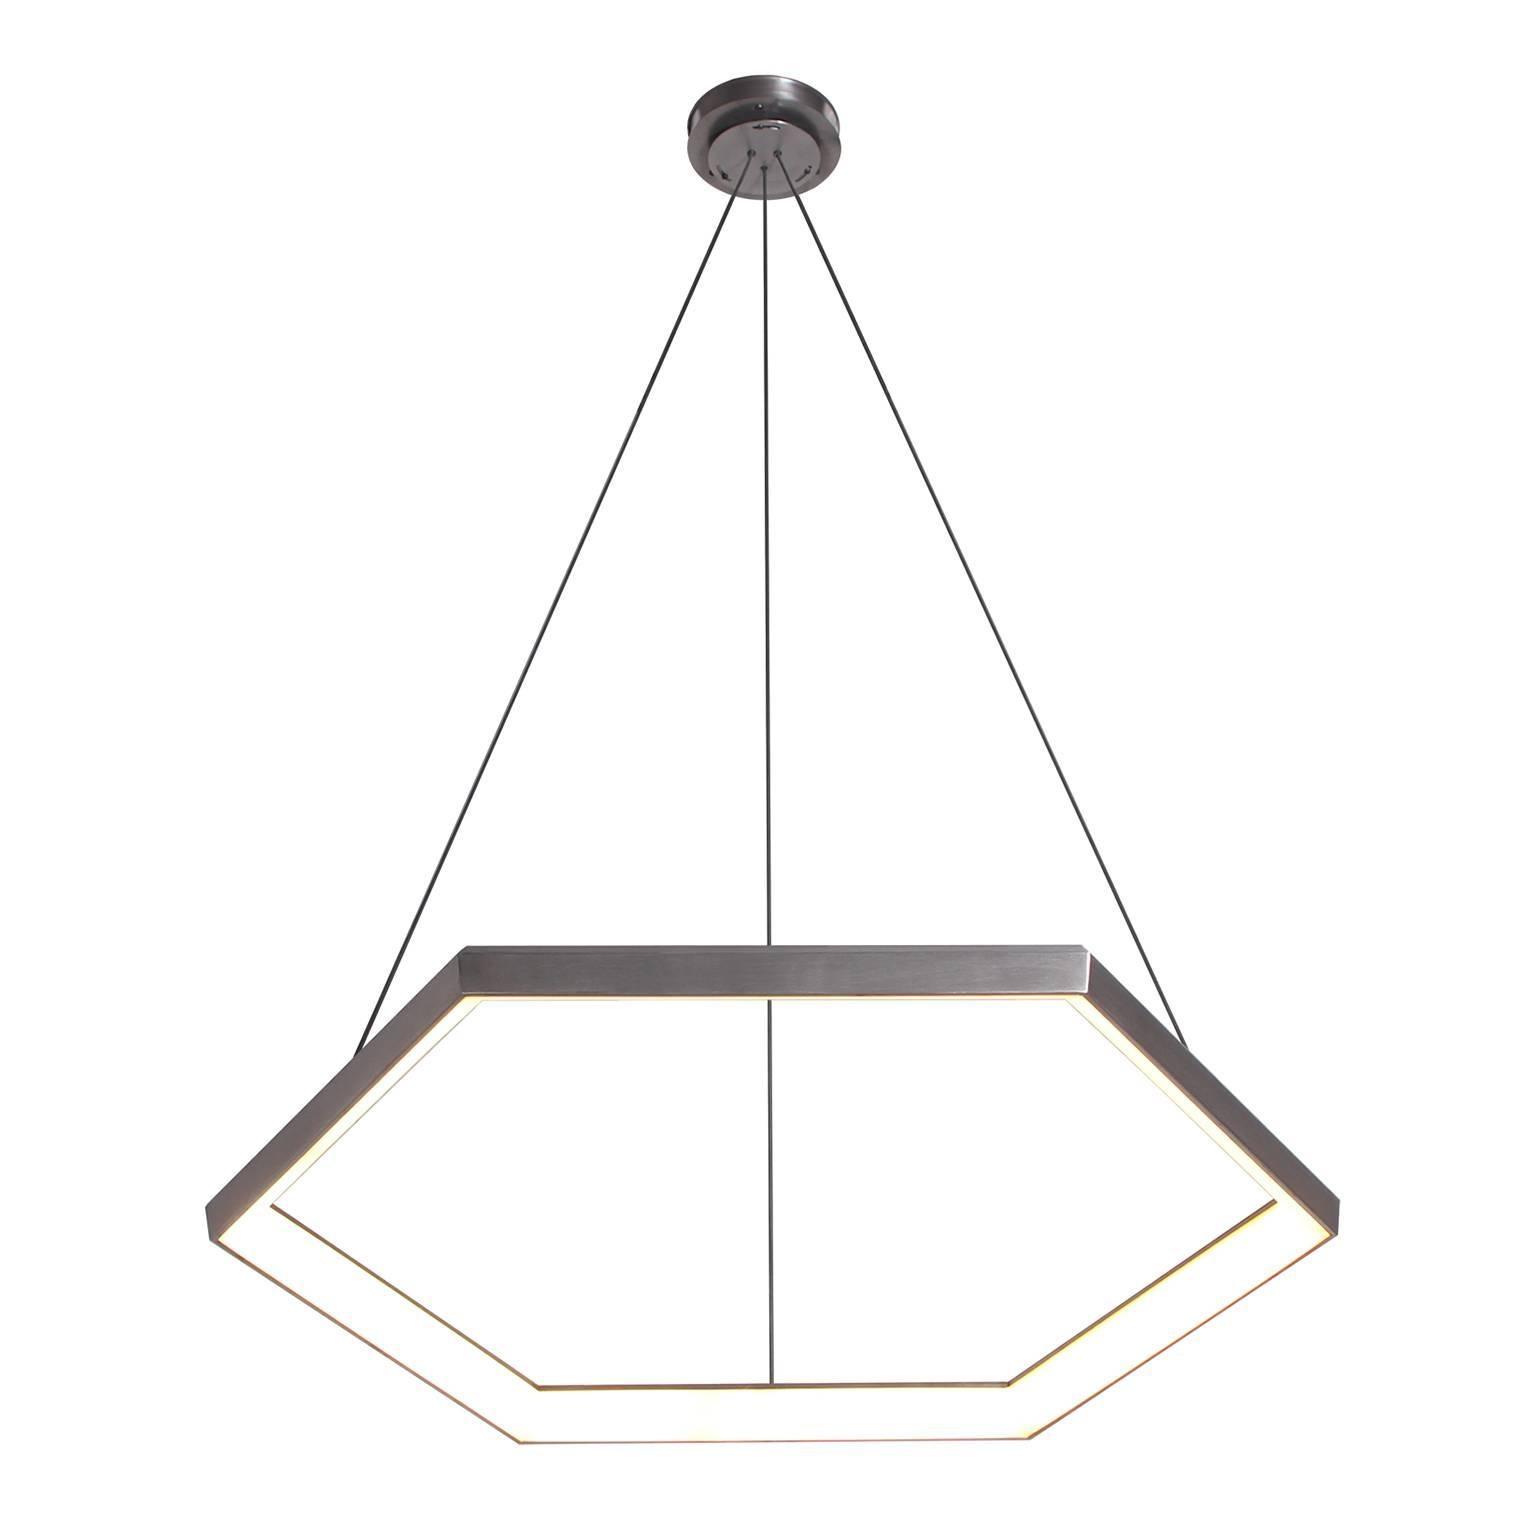 HEXIA HX34 - Black Hexagon Geometric Modern LED Chandelier Light Fixture